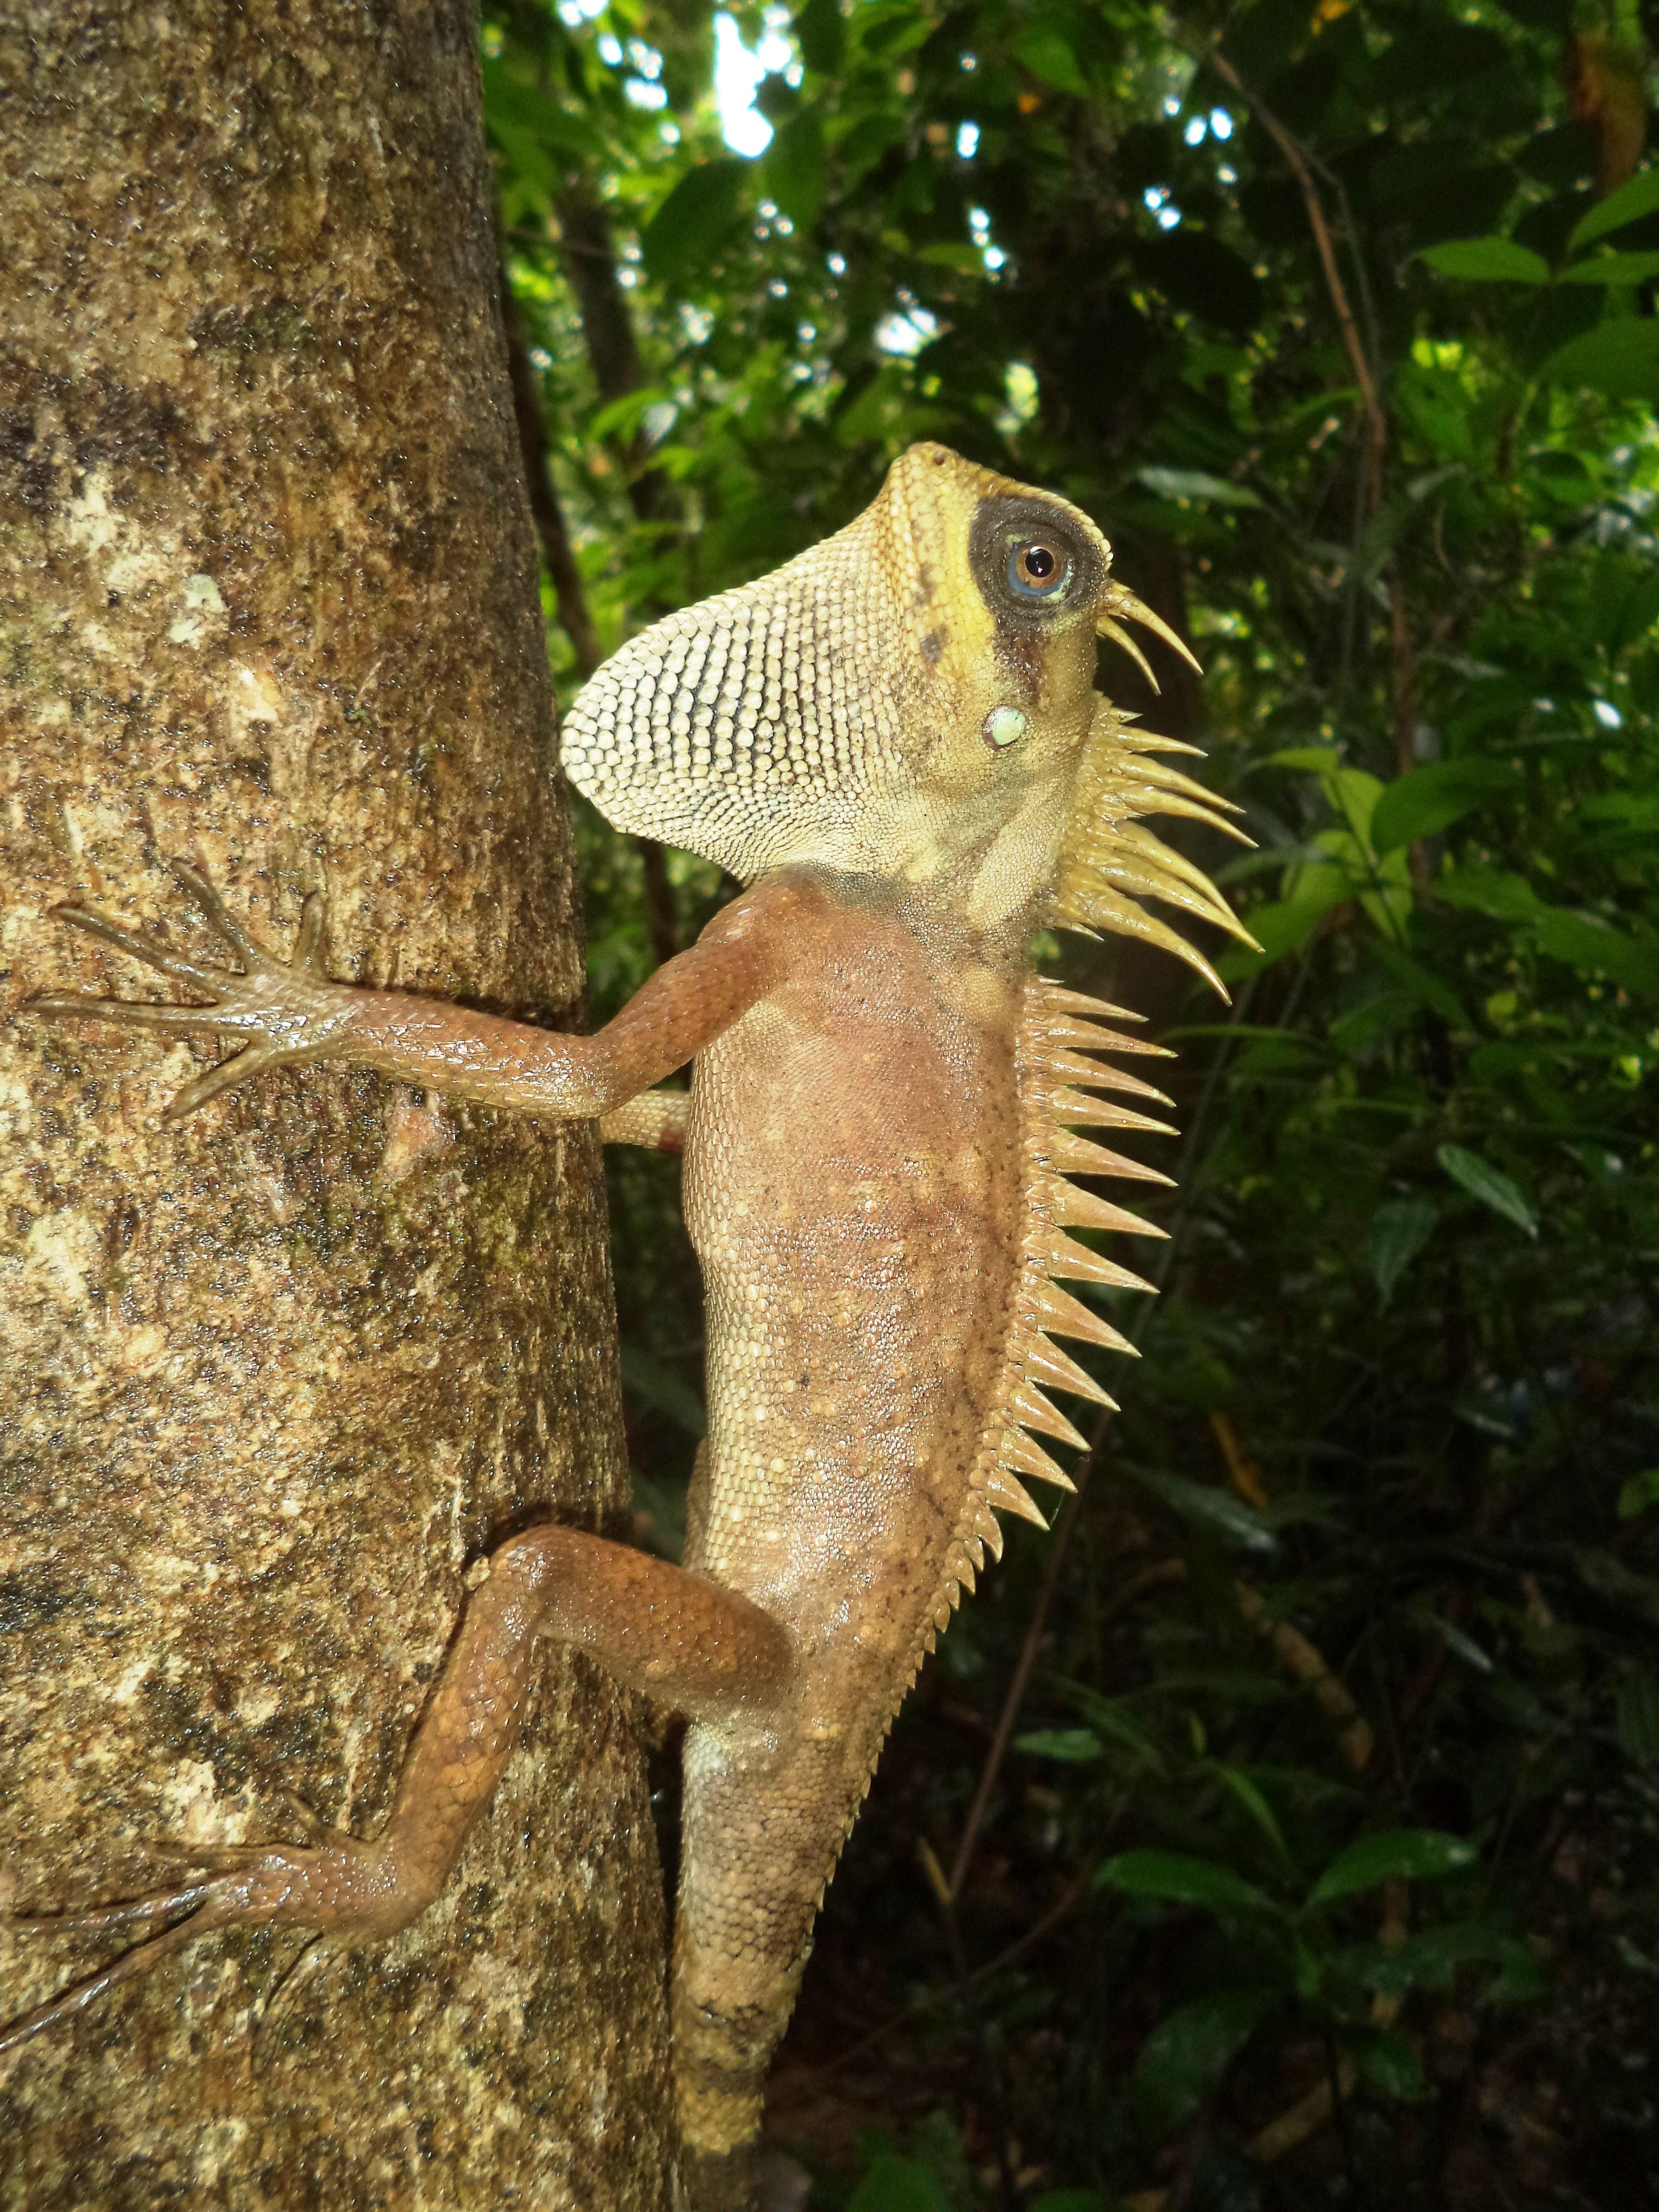 Small forest lizard